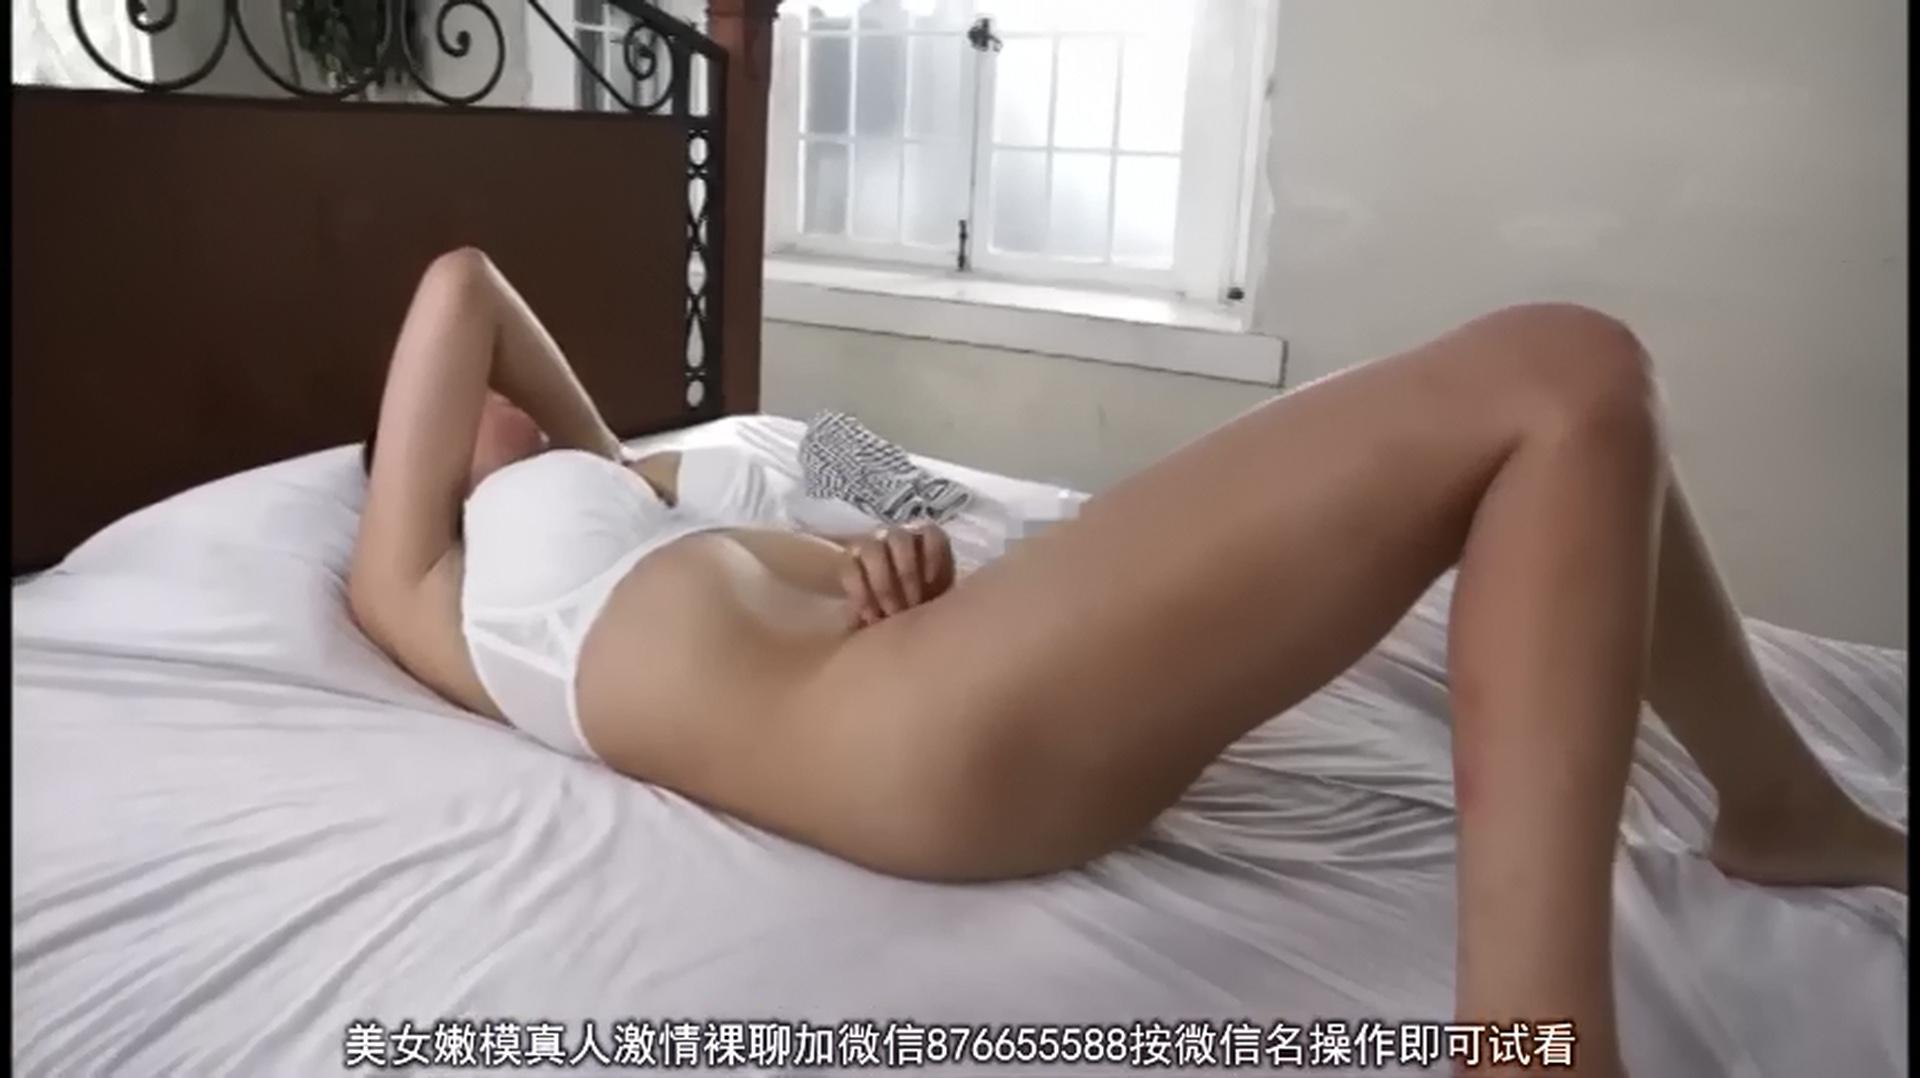 kyoko fukada nude fake kyoko fukada fakes